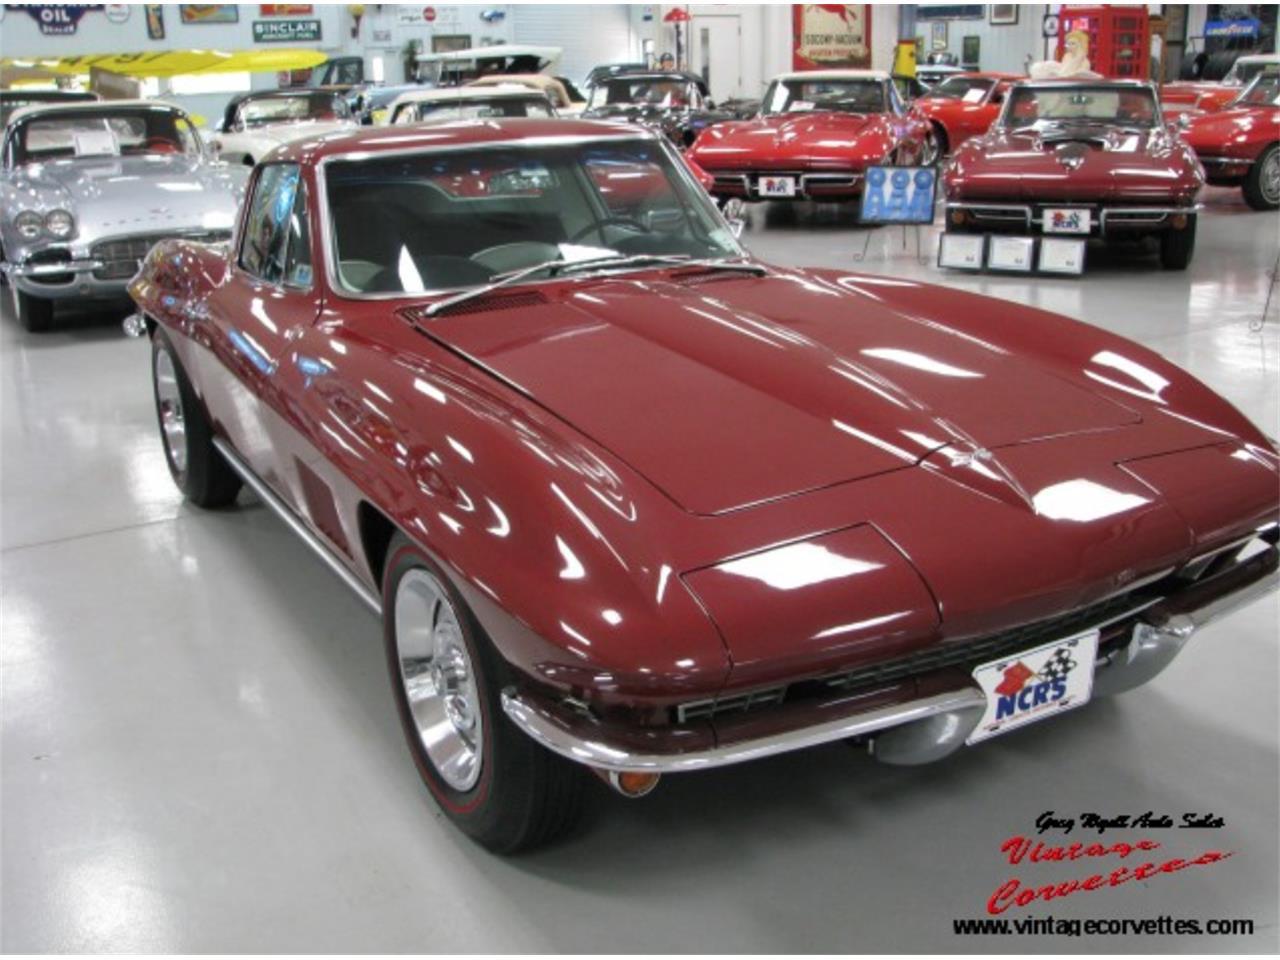 1967 Chevrolet Corvette (CC-1306755) for sale in Summerville, Georgia